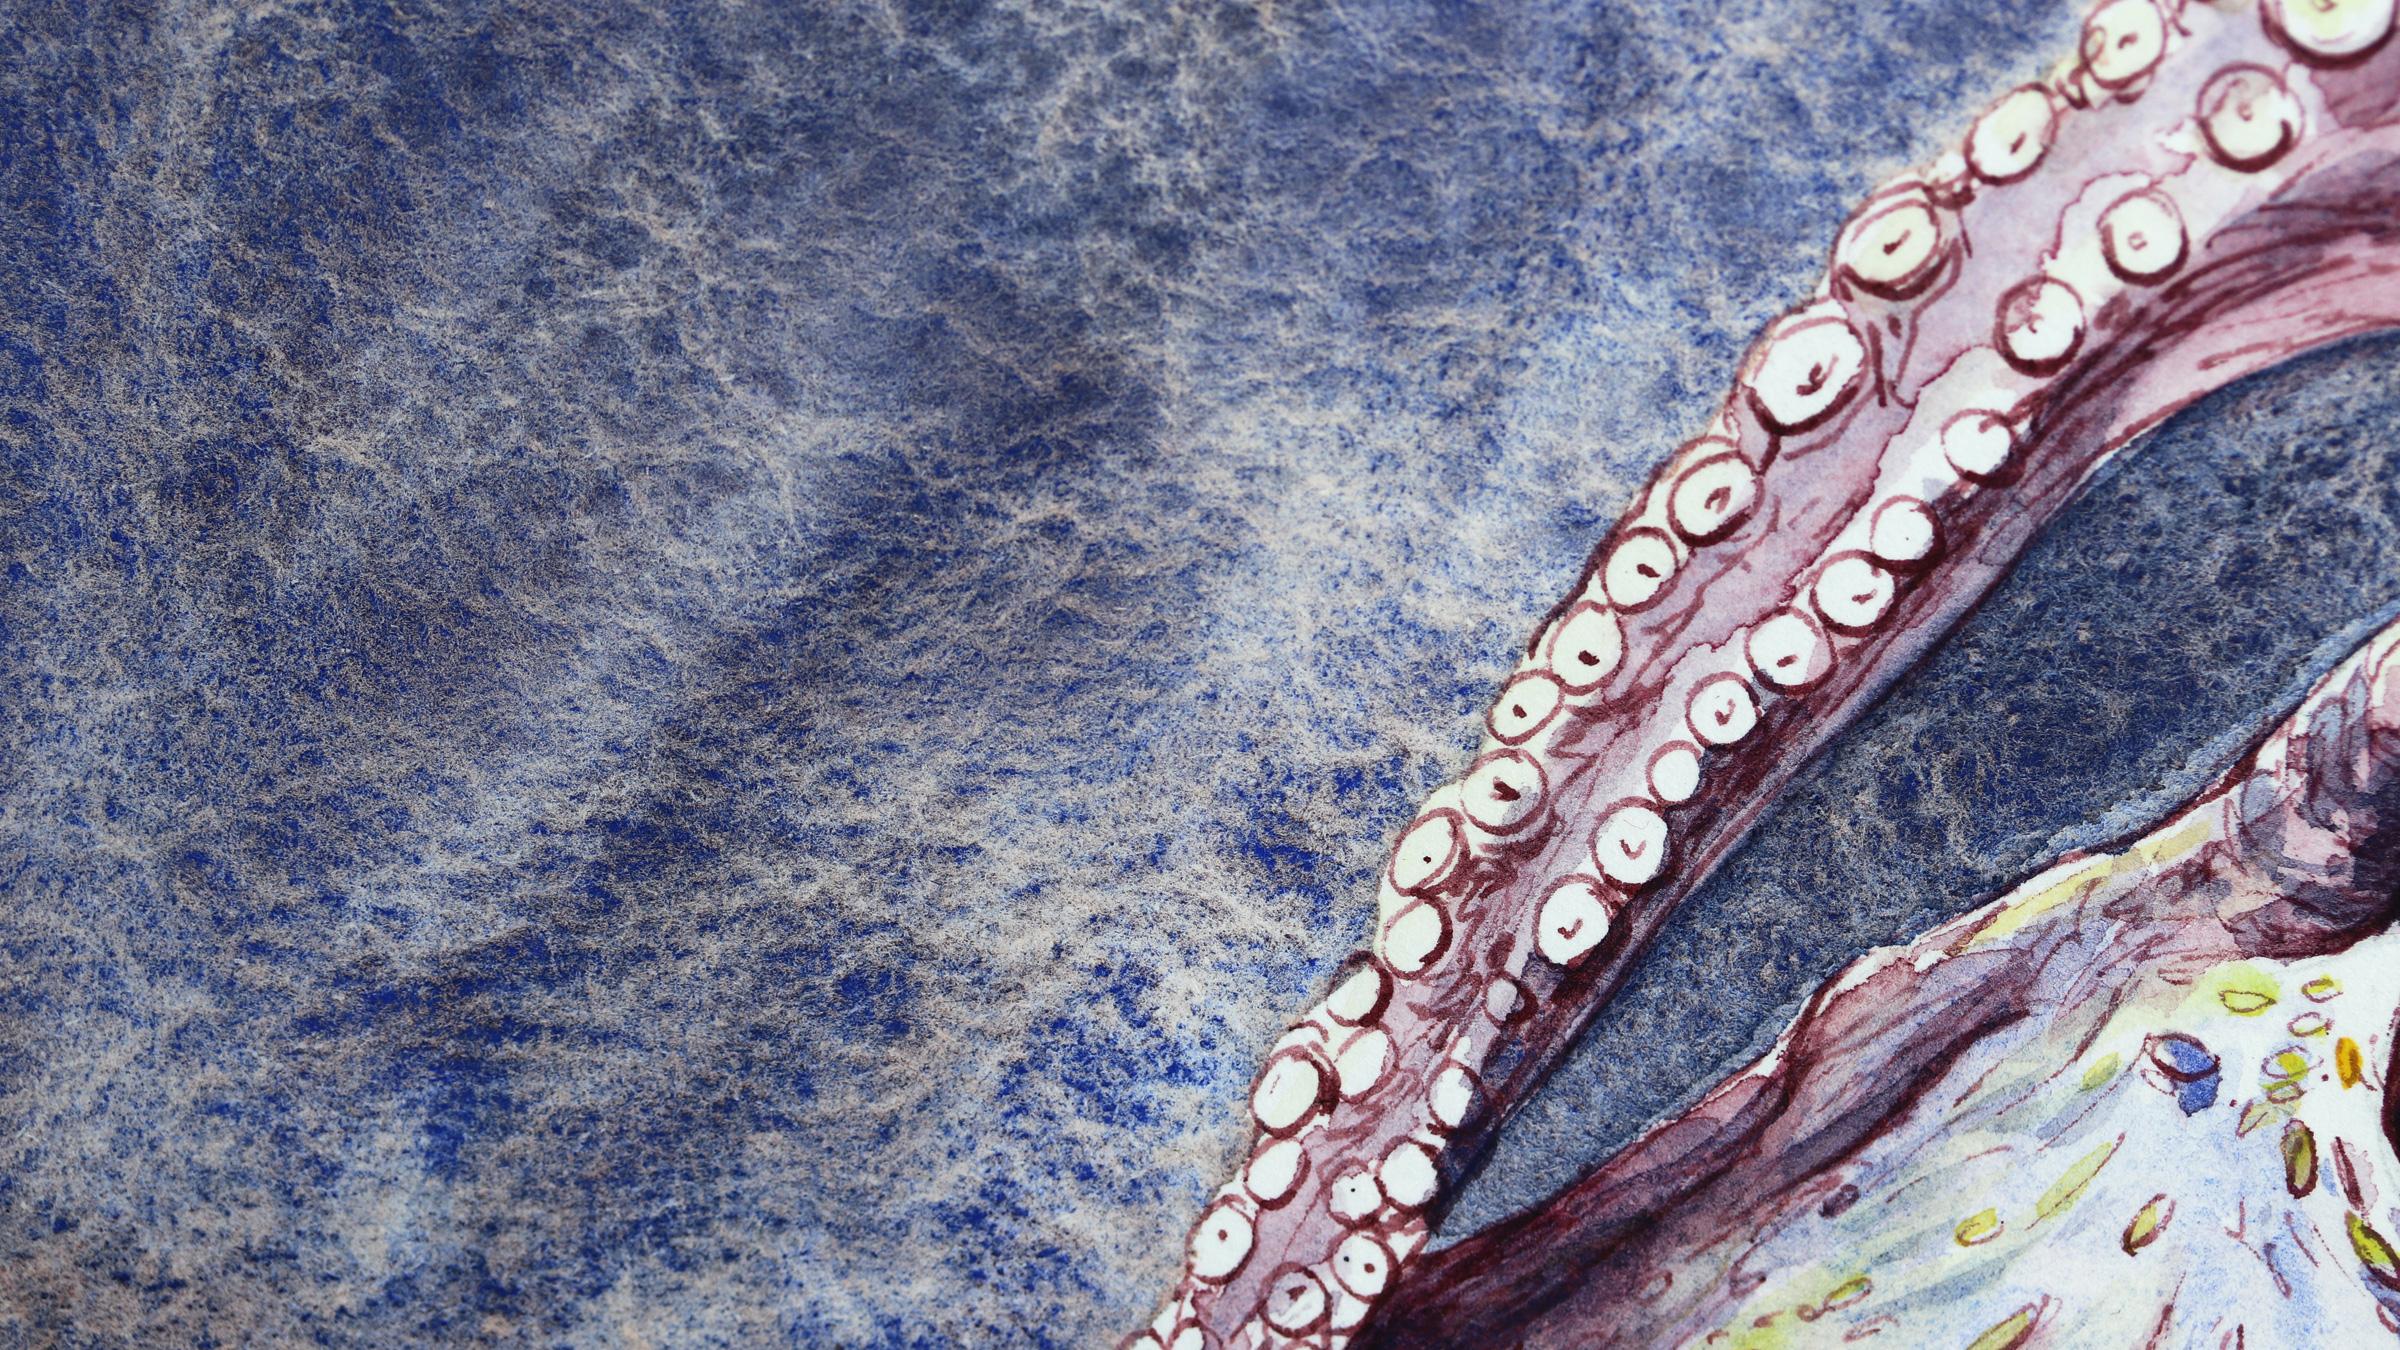 Granulierende Aquarellfarbe – Schmincke Sonderedition: Oktopus mit Horadam Aquarell Supergranulierend Tiefsee Violett (Octupus with Special Edition Supergranulating Deep sea violet)